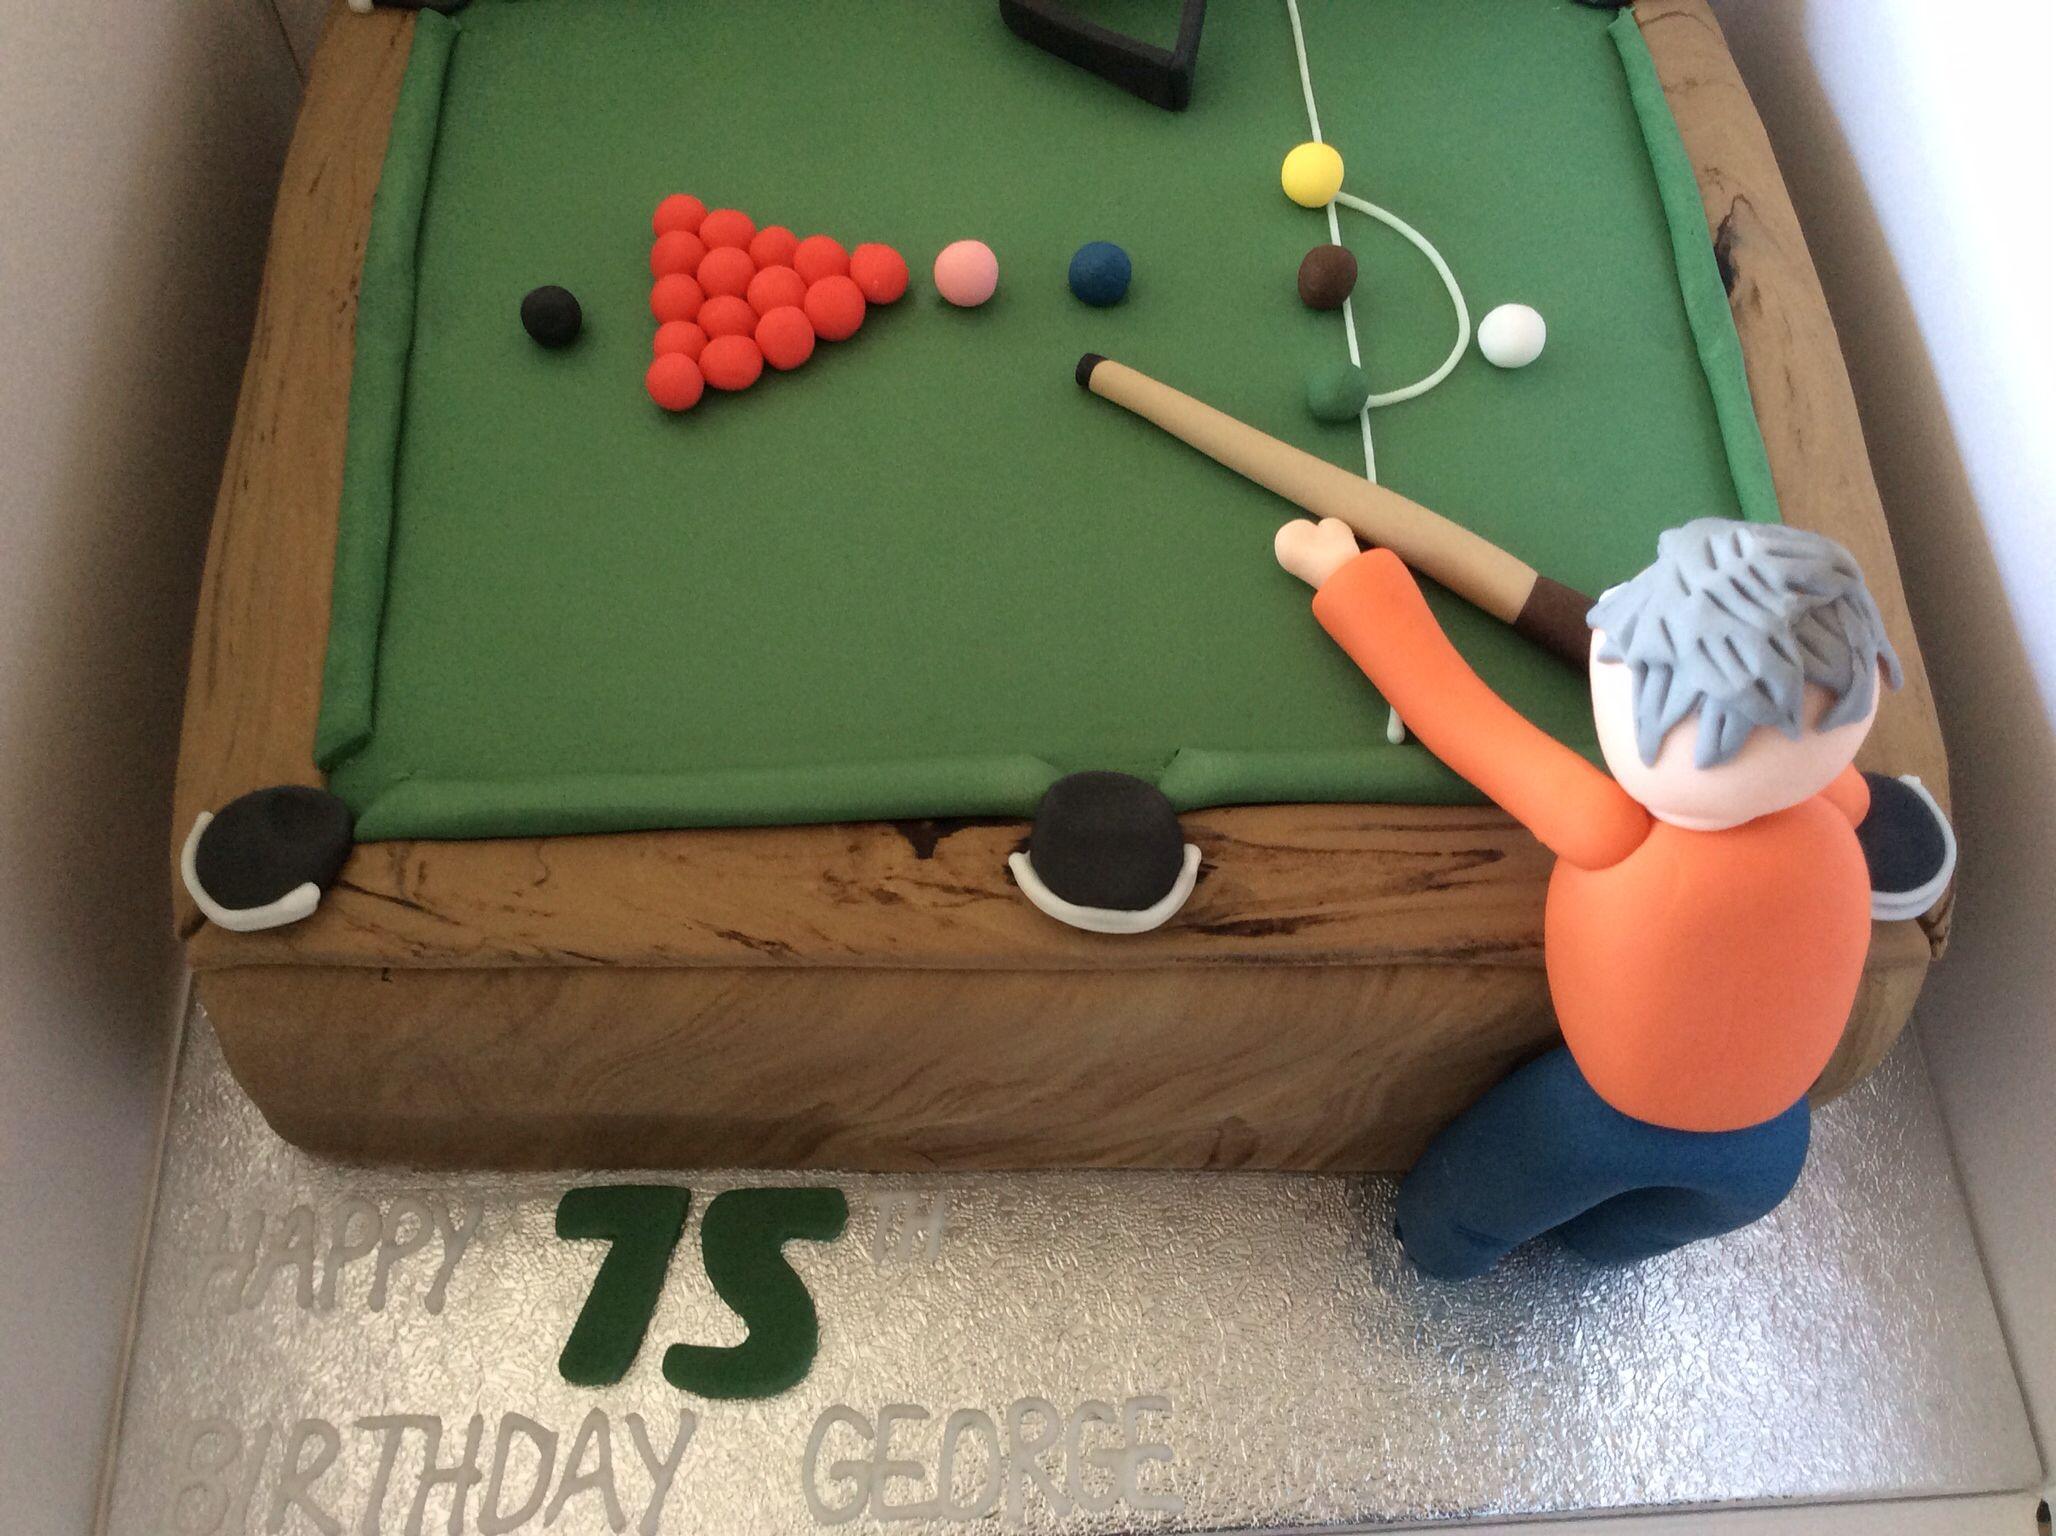 Snooker cake birthday planning pinterest cakes